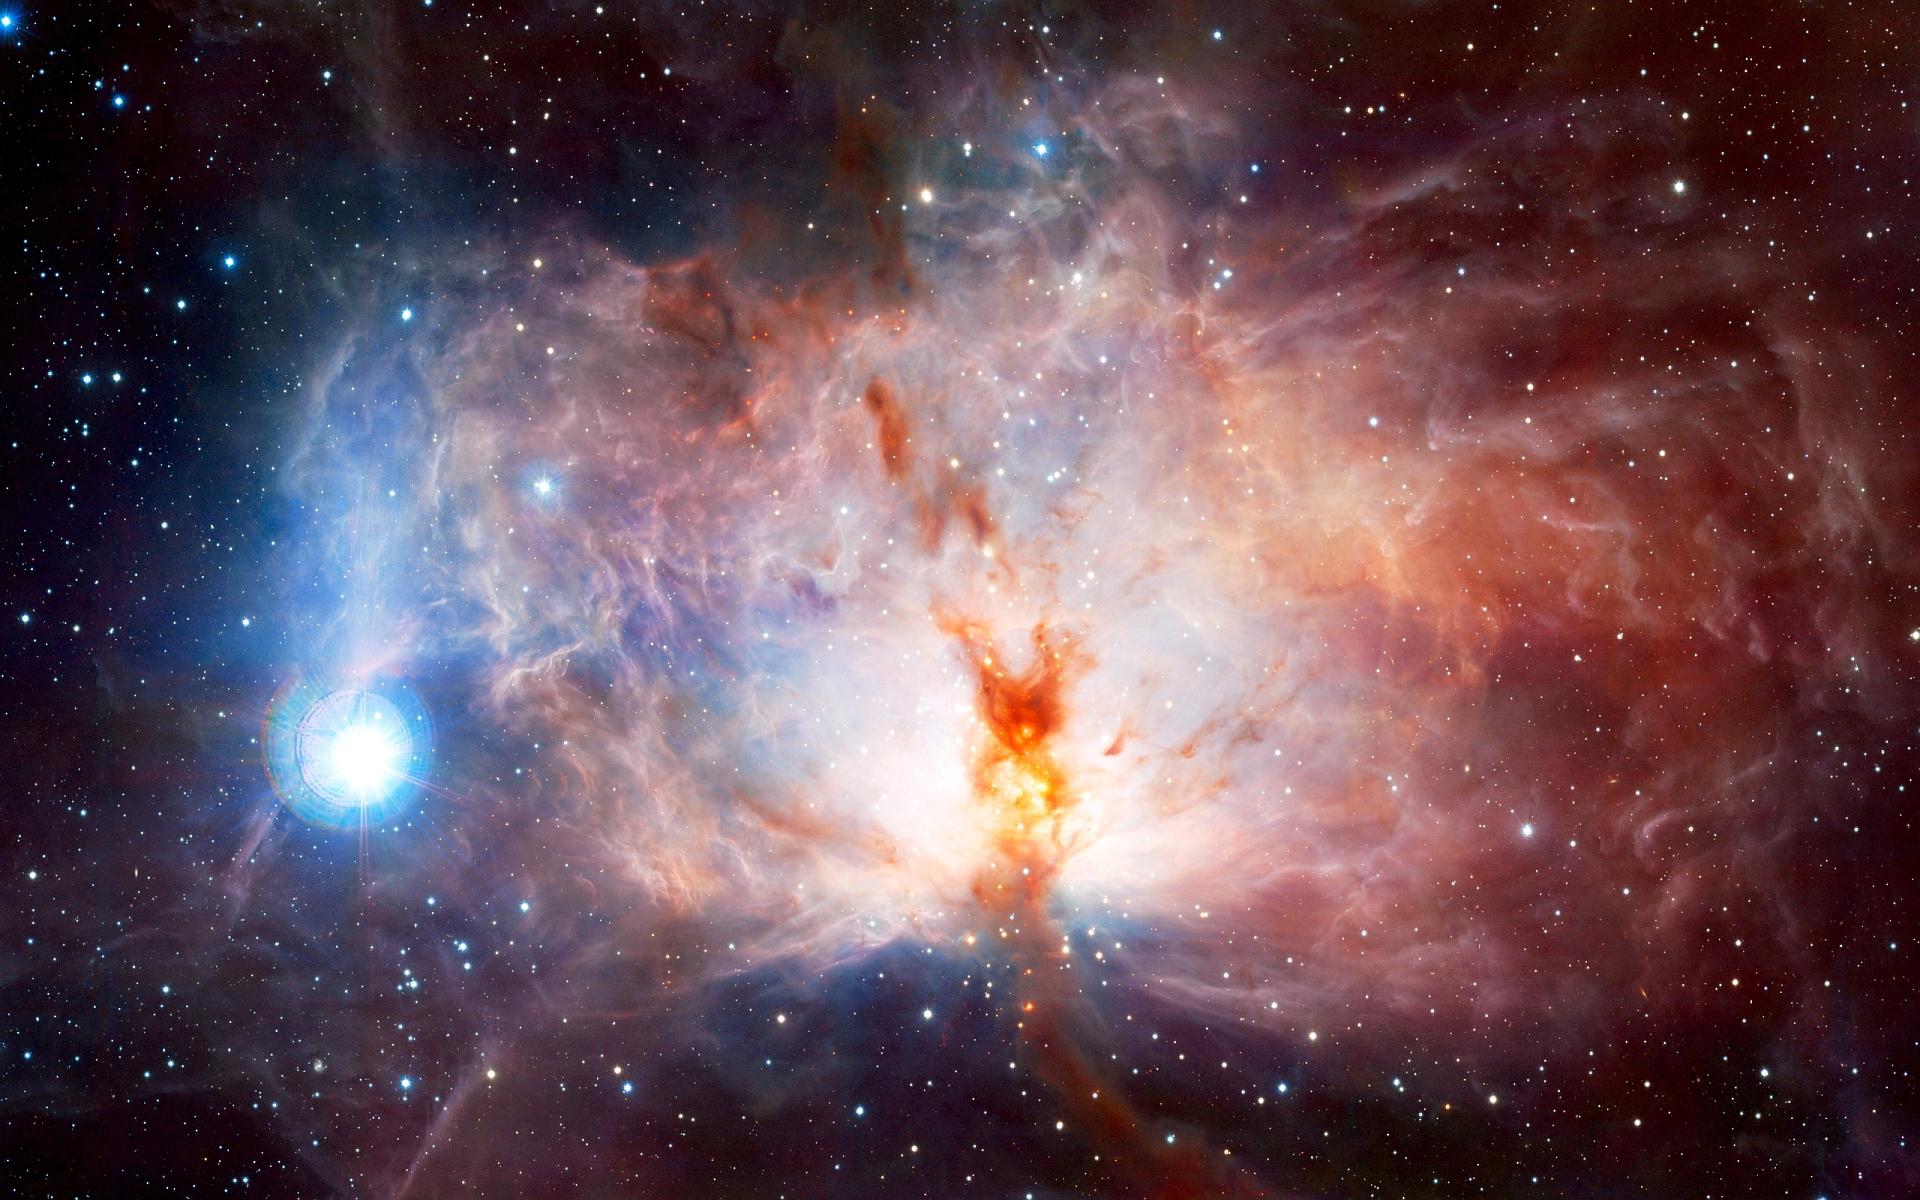 Cosmic nebula flame